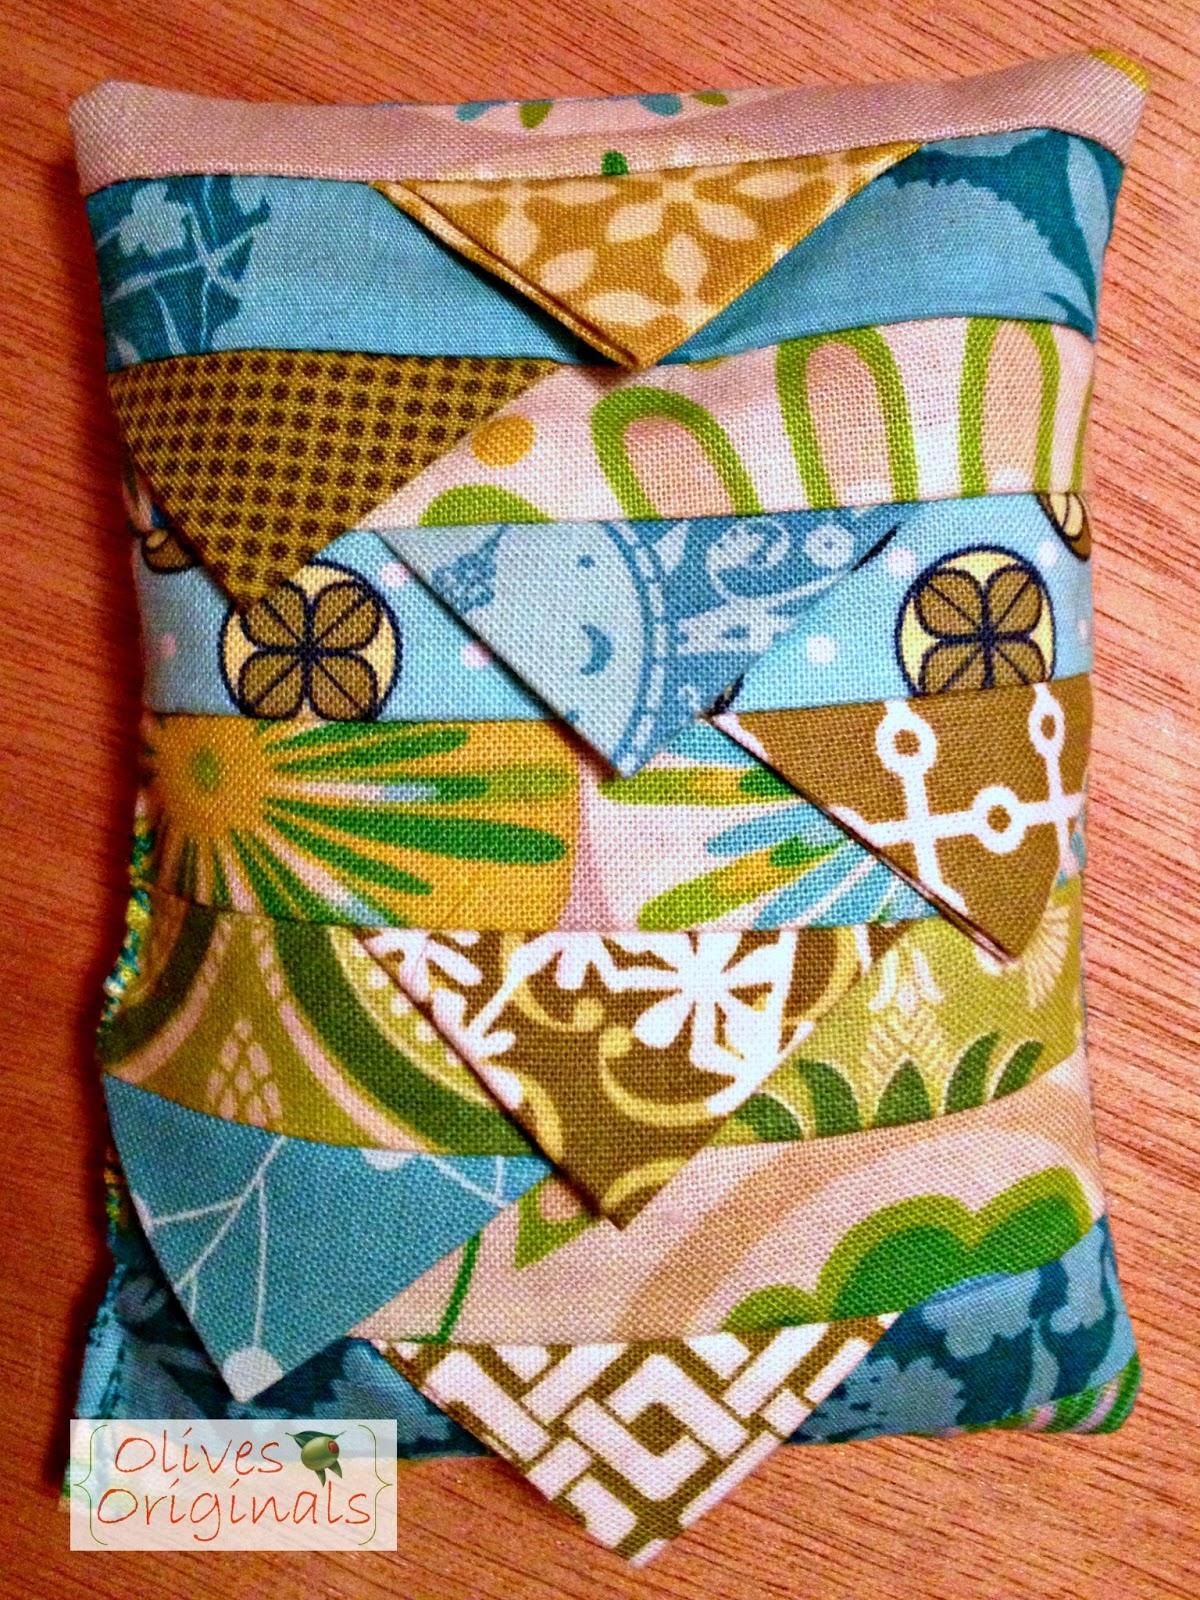 Quilt Guild Exchange Ideas : Olives Originals: Modern Quilt Guild Pin Cushion Exchange